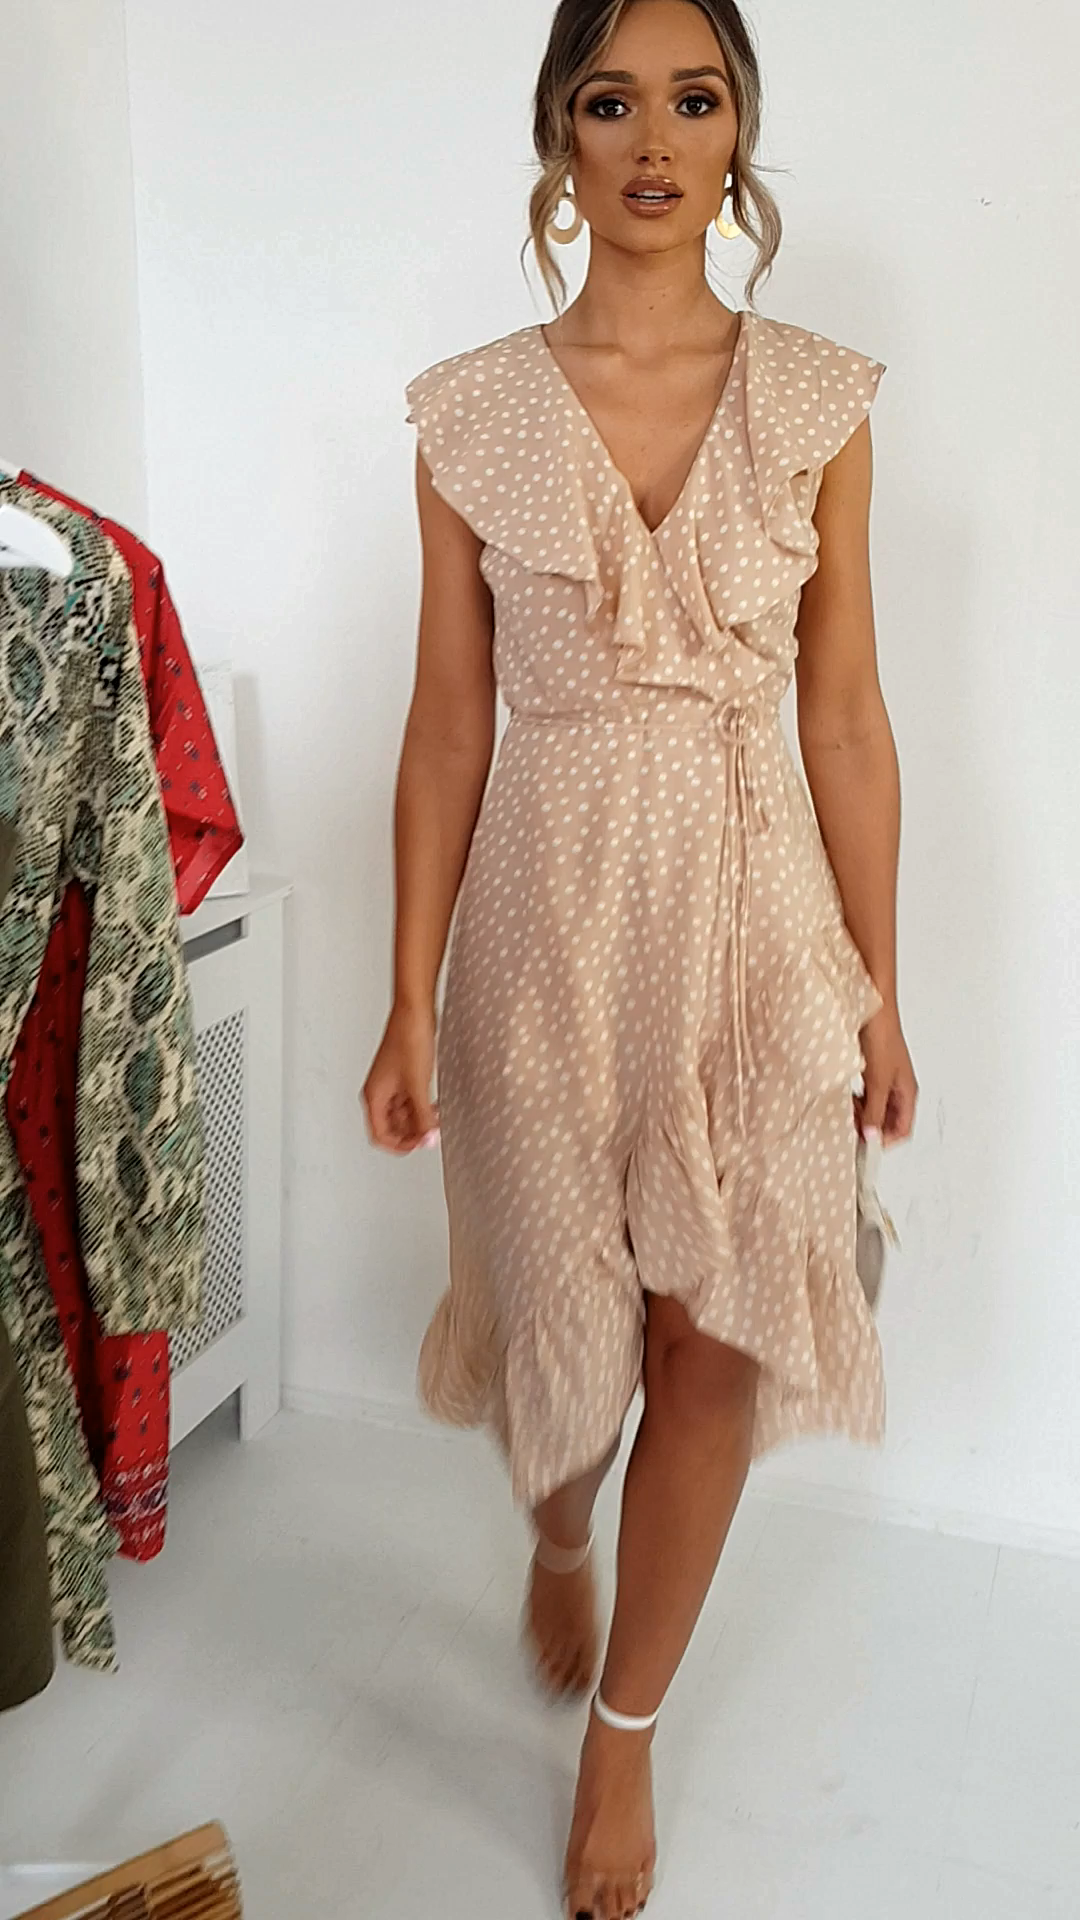 Wrapdress In 2020 Elegant Summer Dresses Dot Dress Outfit Floaty Summer Dresses